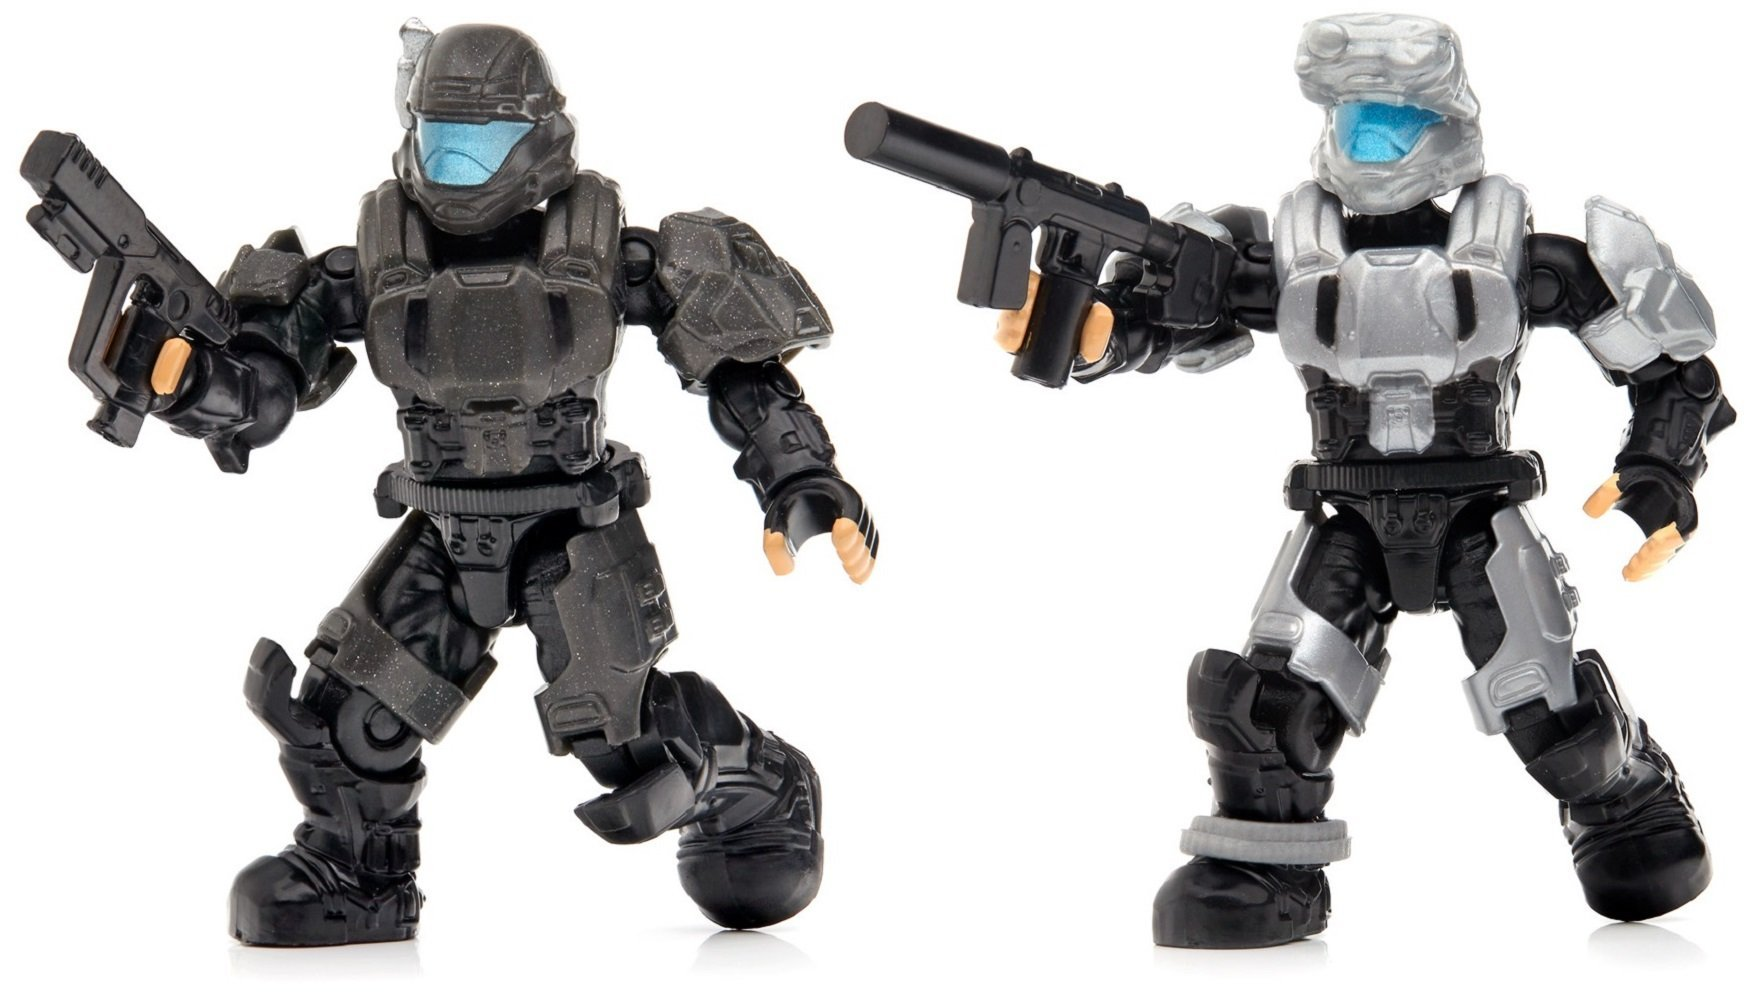 Mega Bloks Halo Elite Orbital Drop Shock Troopers Weapons Customizer Pack